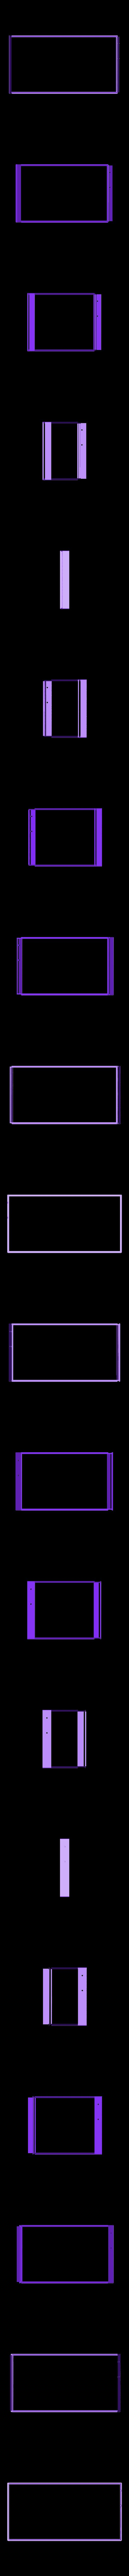 matrix-frame.stl Download free STL file RGB Matrix Slot Machine • 3D print object, Adafruit